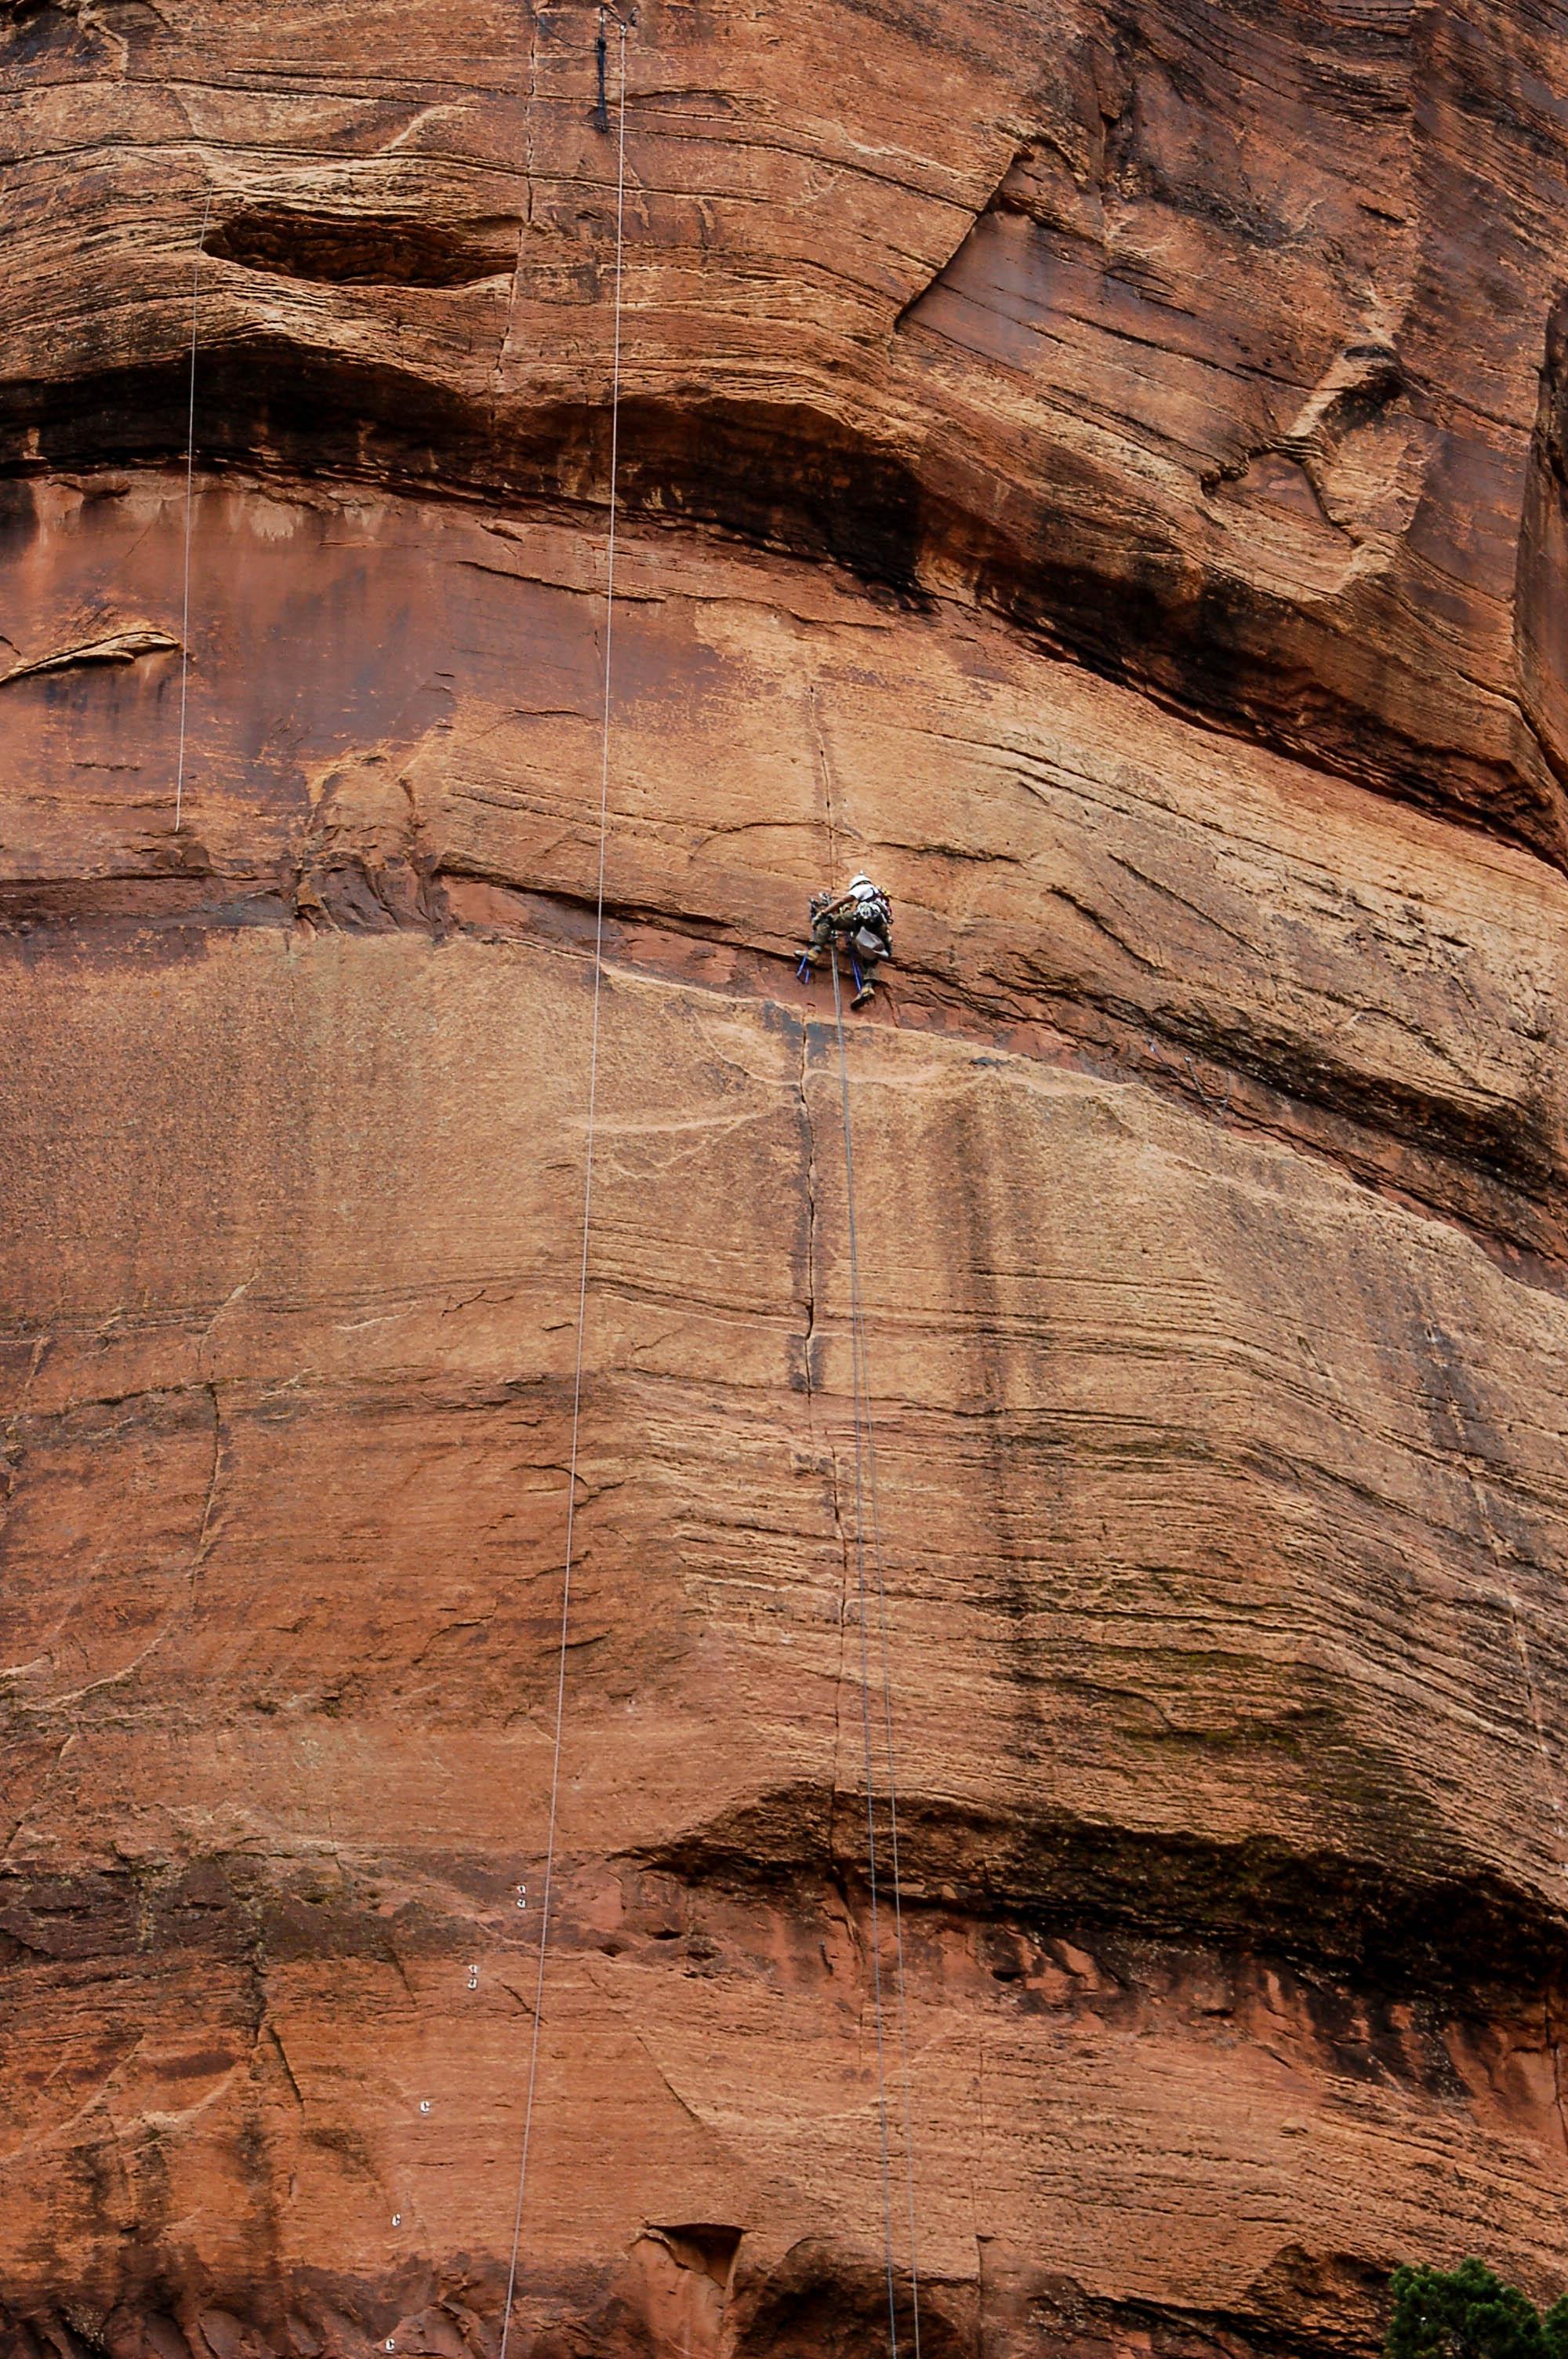 Climbing the Rockface